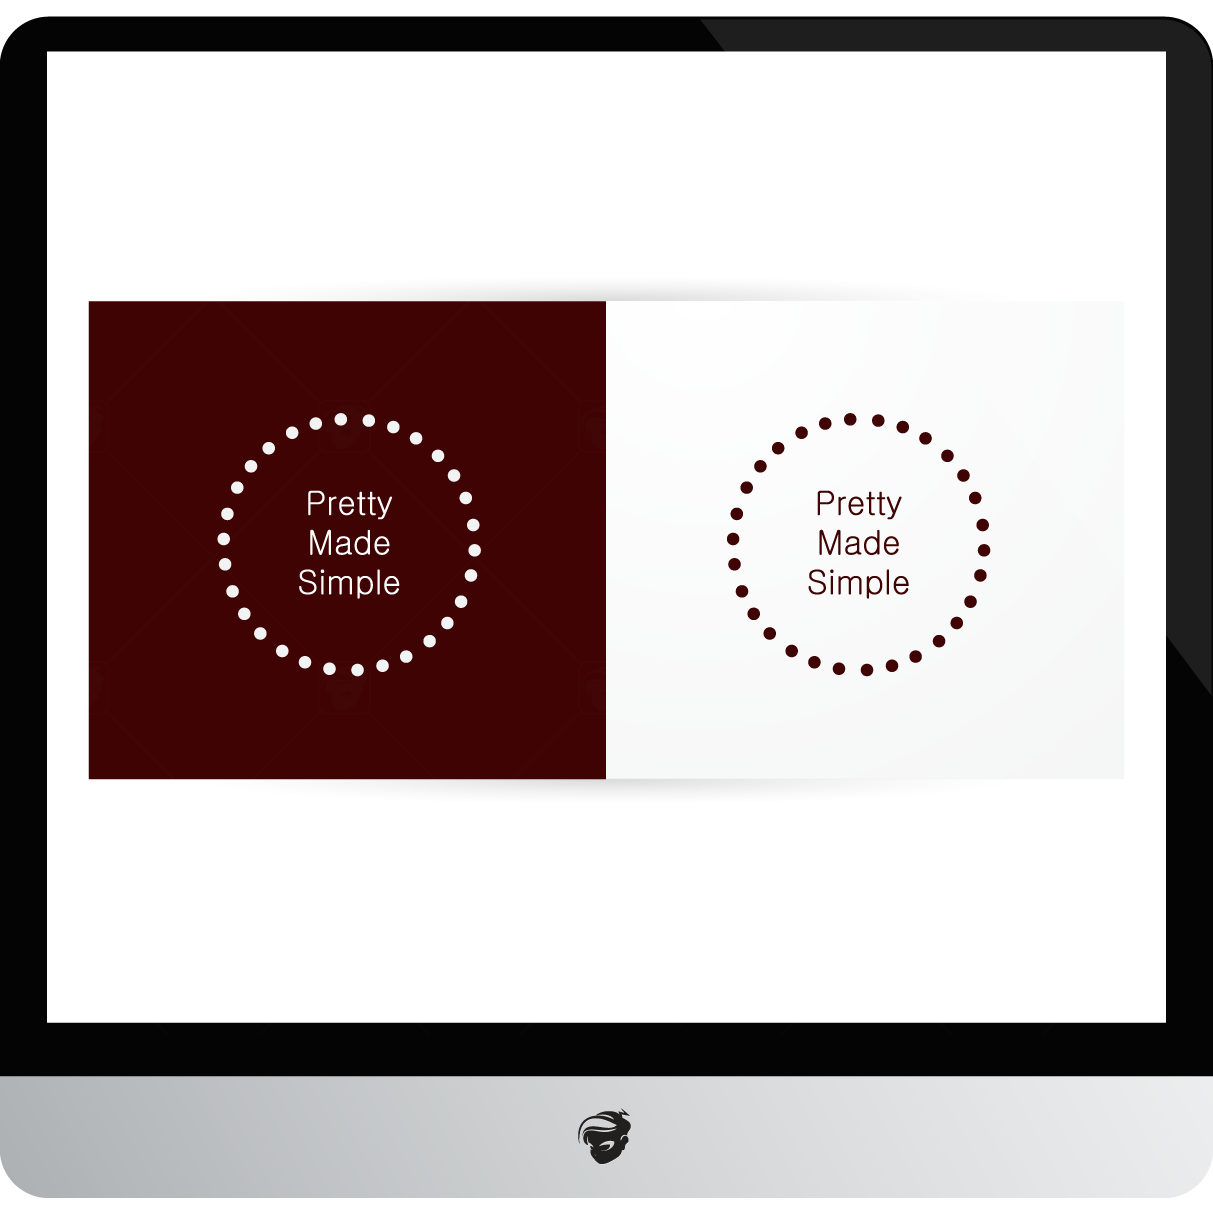 Logo Design by zesthar - Entry No. 54 in the Logo Design Contest Pretty Made Simple Logo Design.